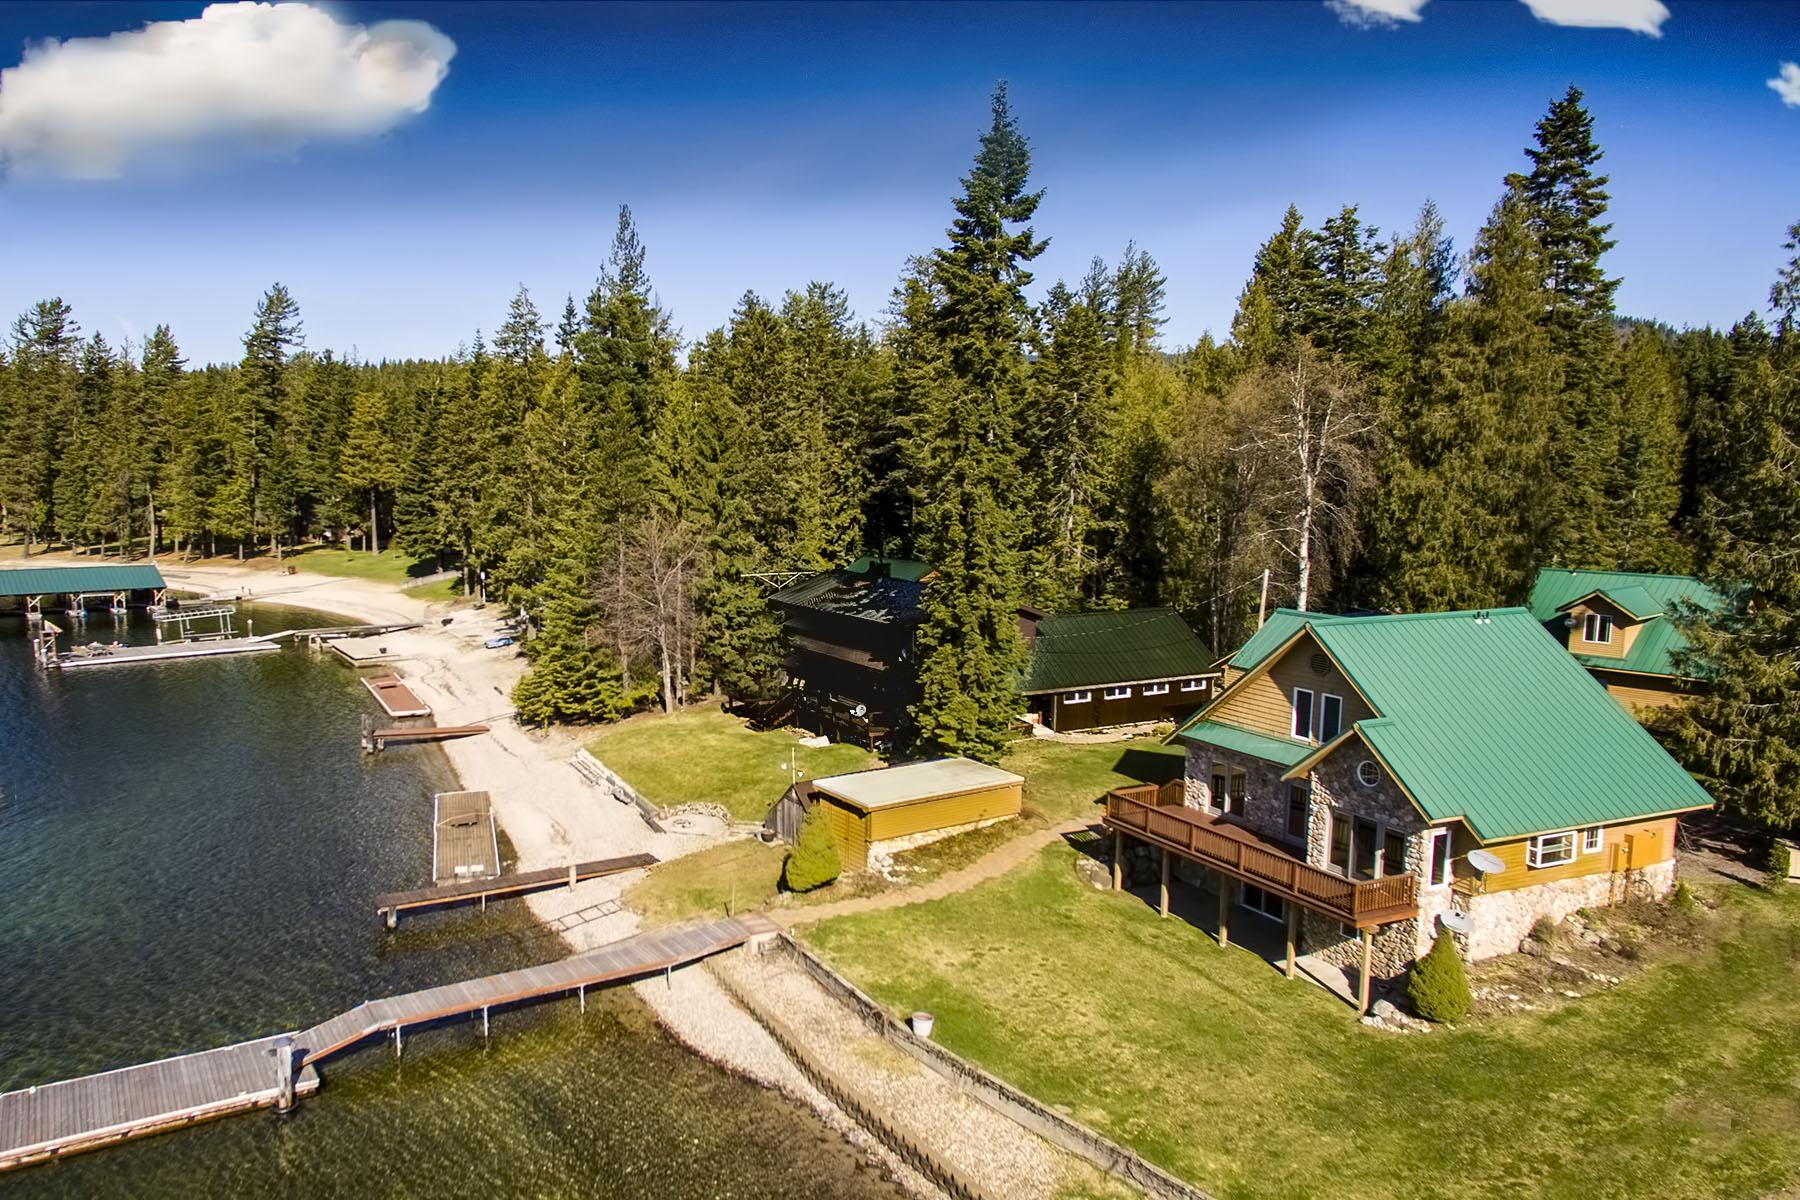 Villa per Vendita alle ore 5 Ac Reeder Bay Lot in Nordman, ID 16 Sunrise Lane Nordman, Idaho, 83848 Stati Uniti